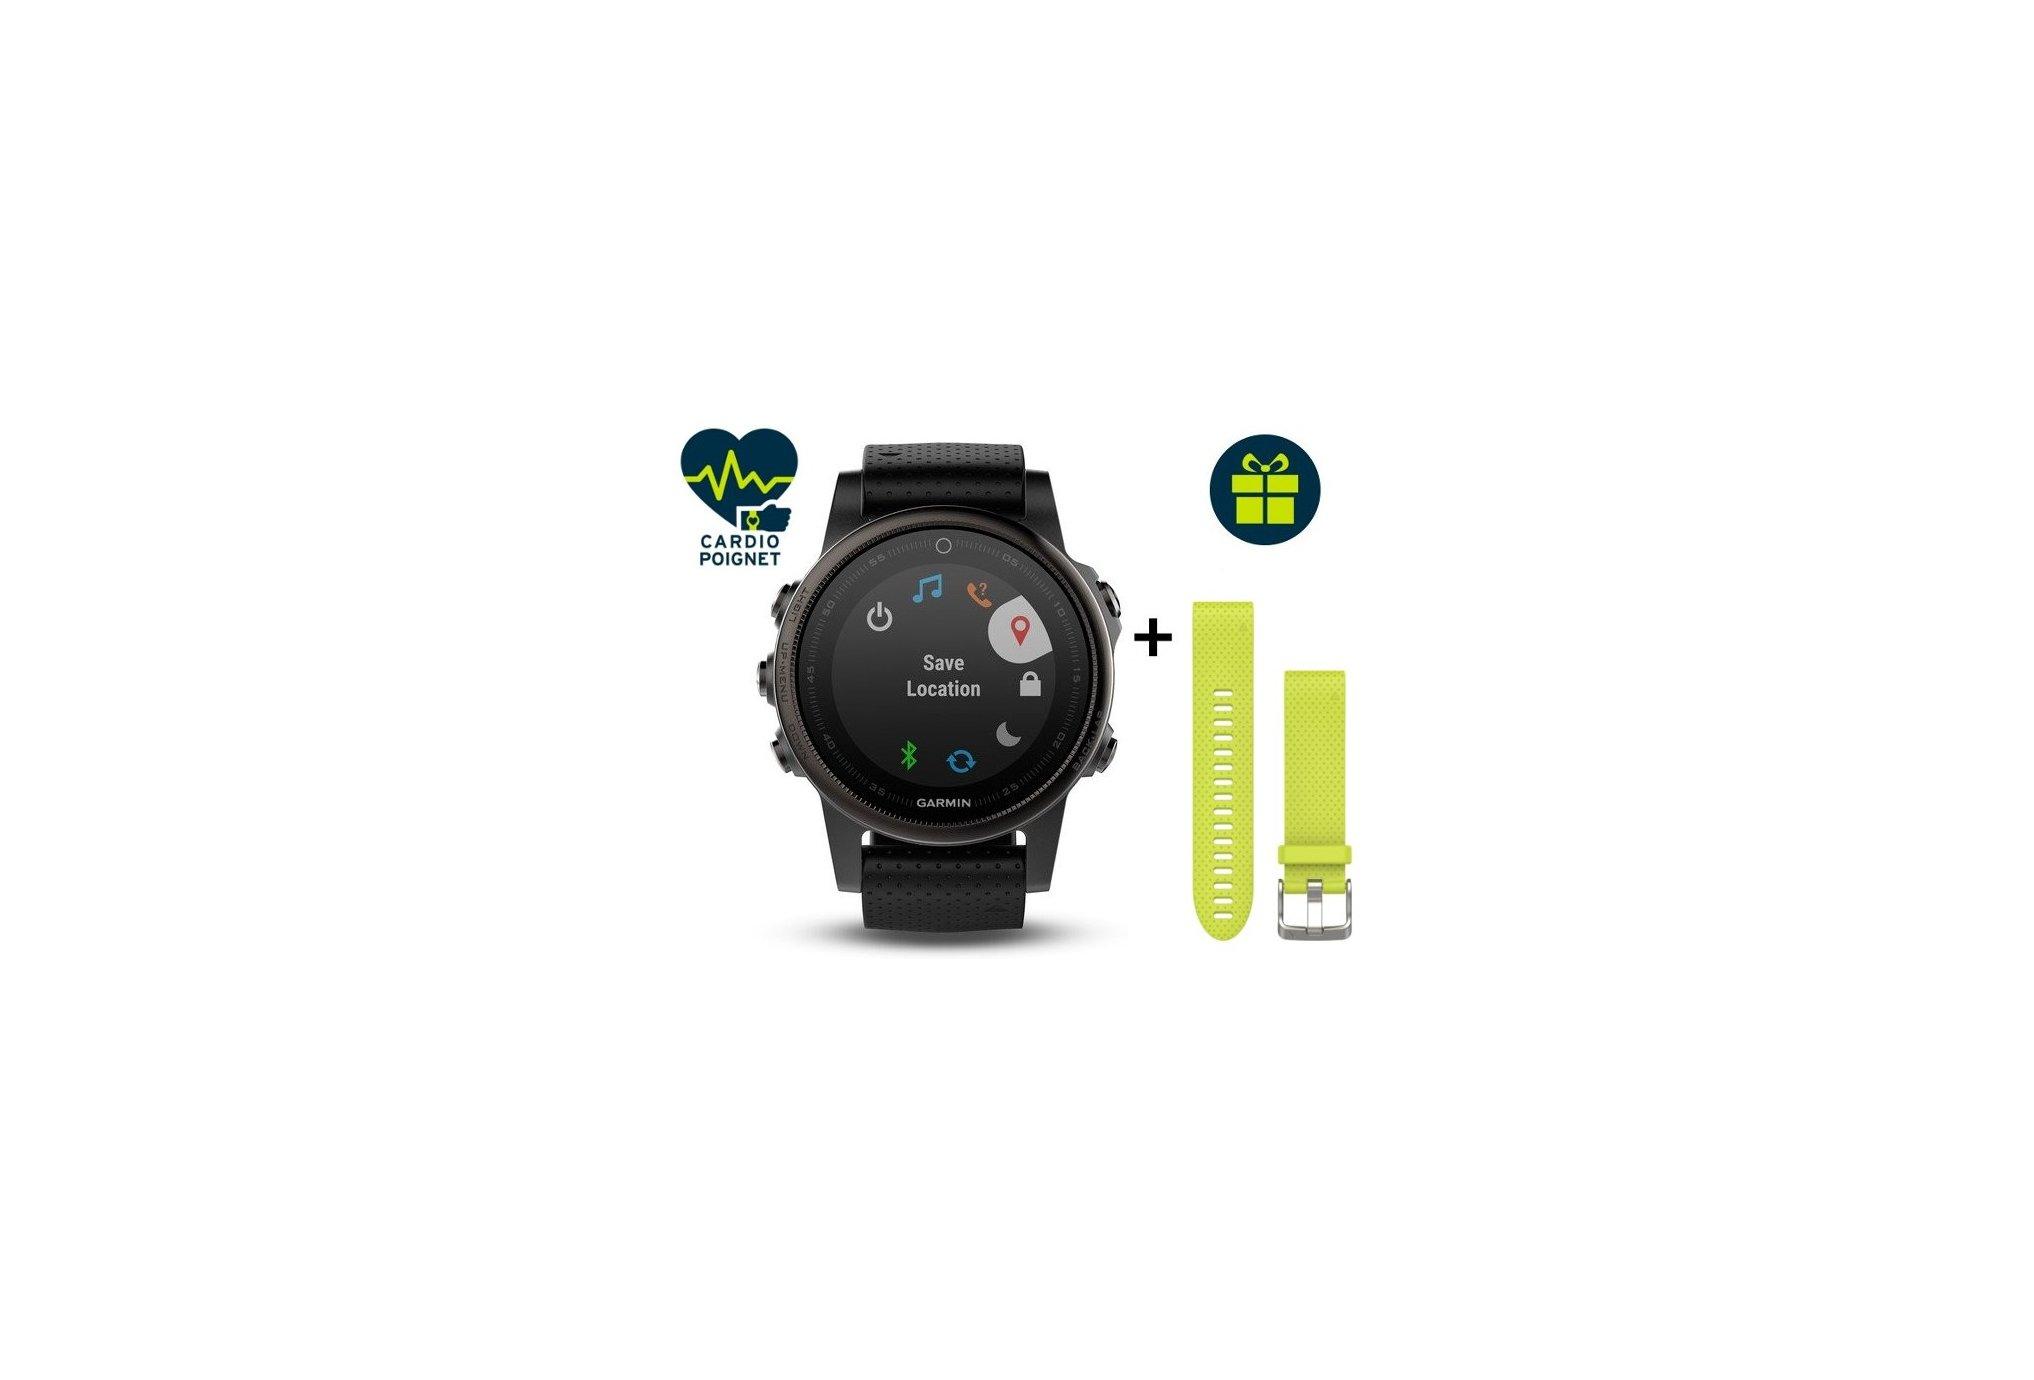 Garmin Reloj Fénix 5 S GPS Multisports Sapphire Black Cardio-Gps